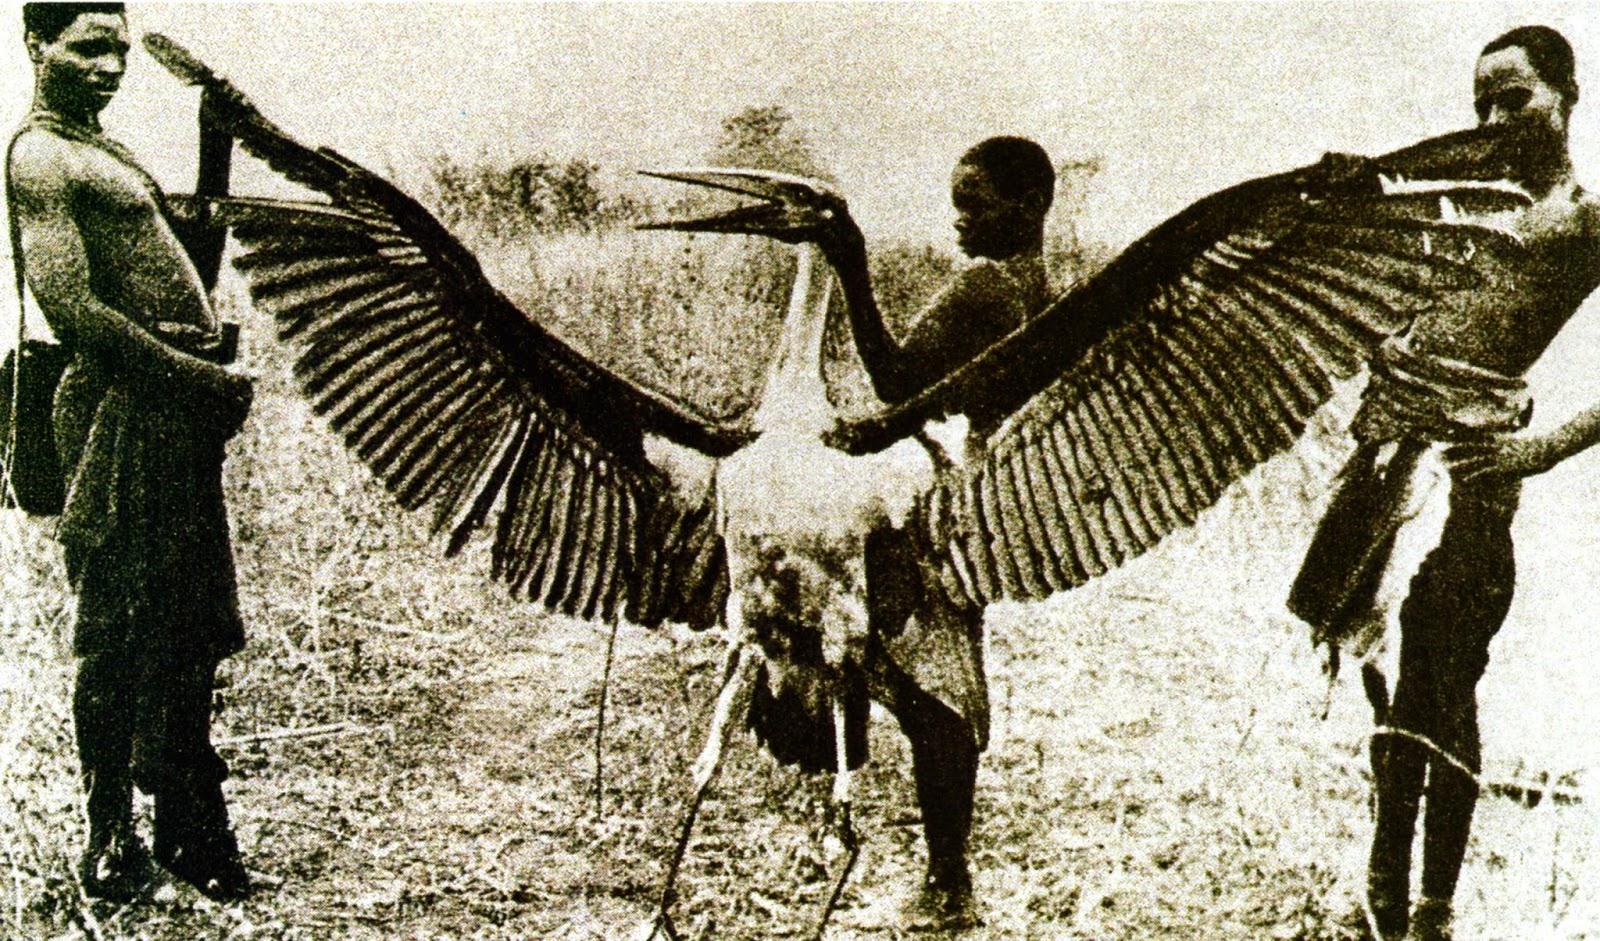 SEEKING THE MISSING THUNDERBIRD PHOTOGRAPH